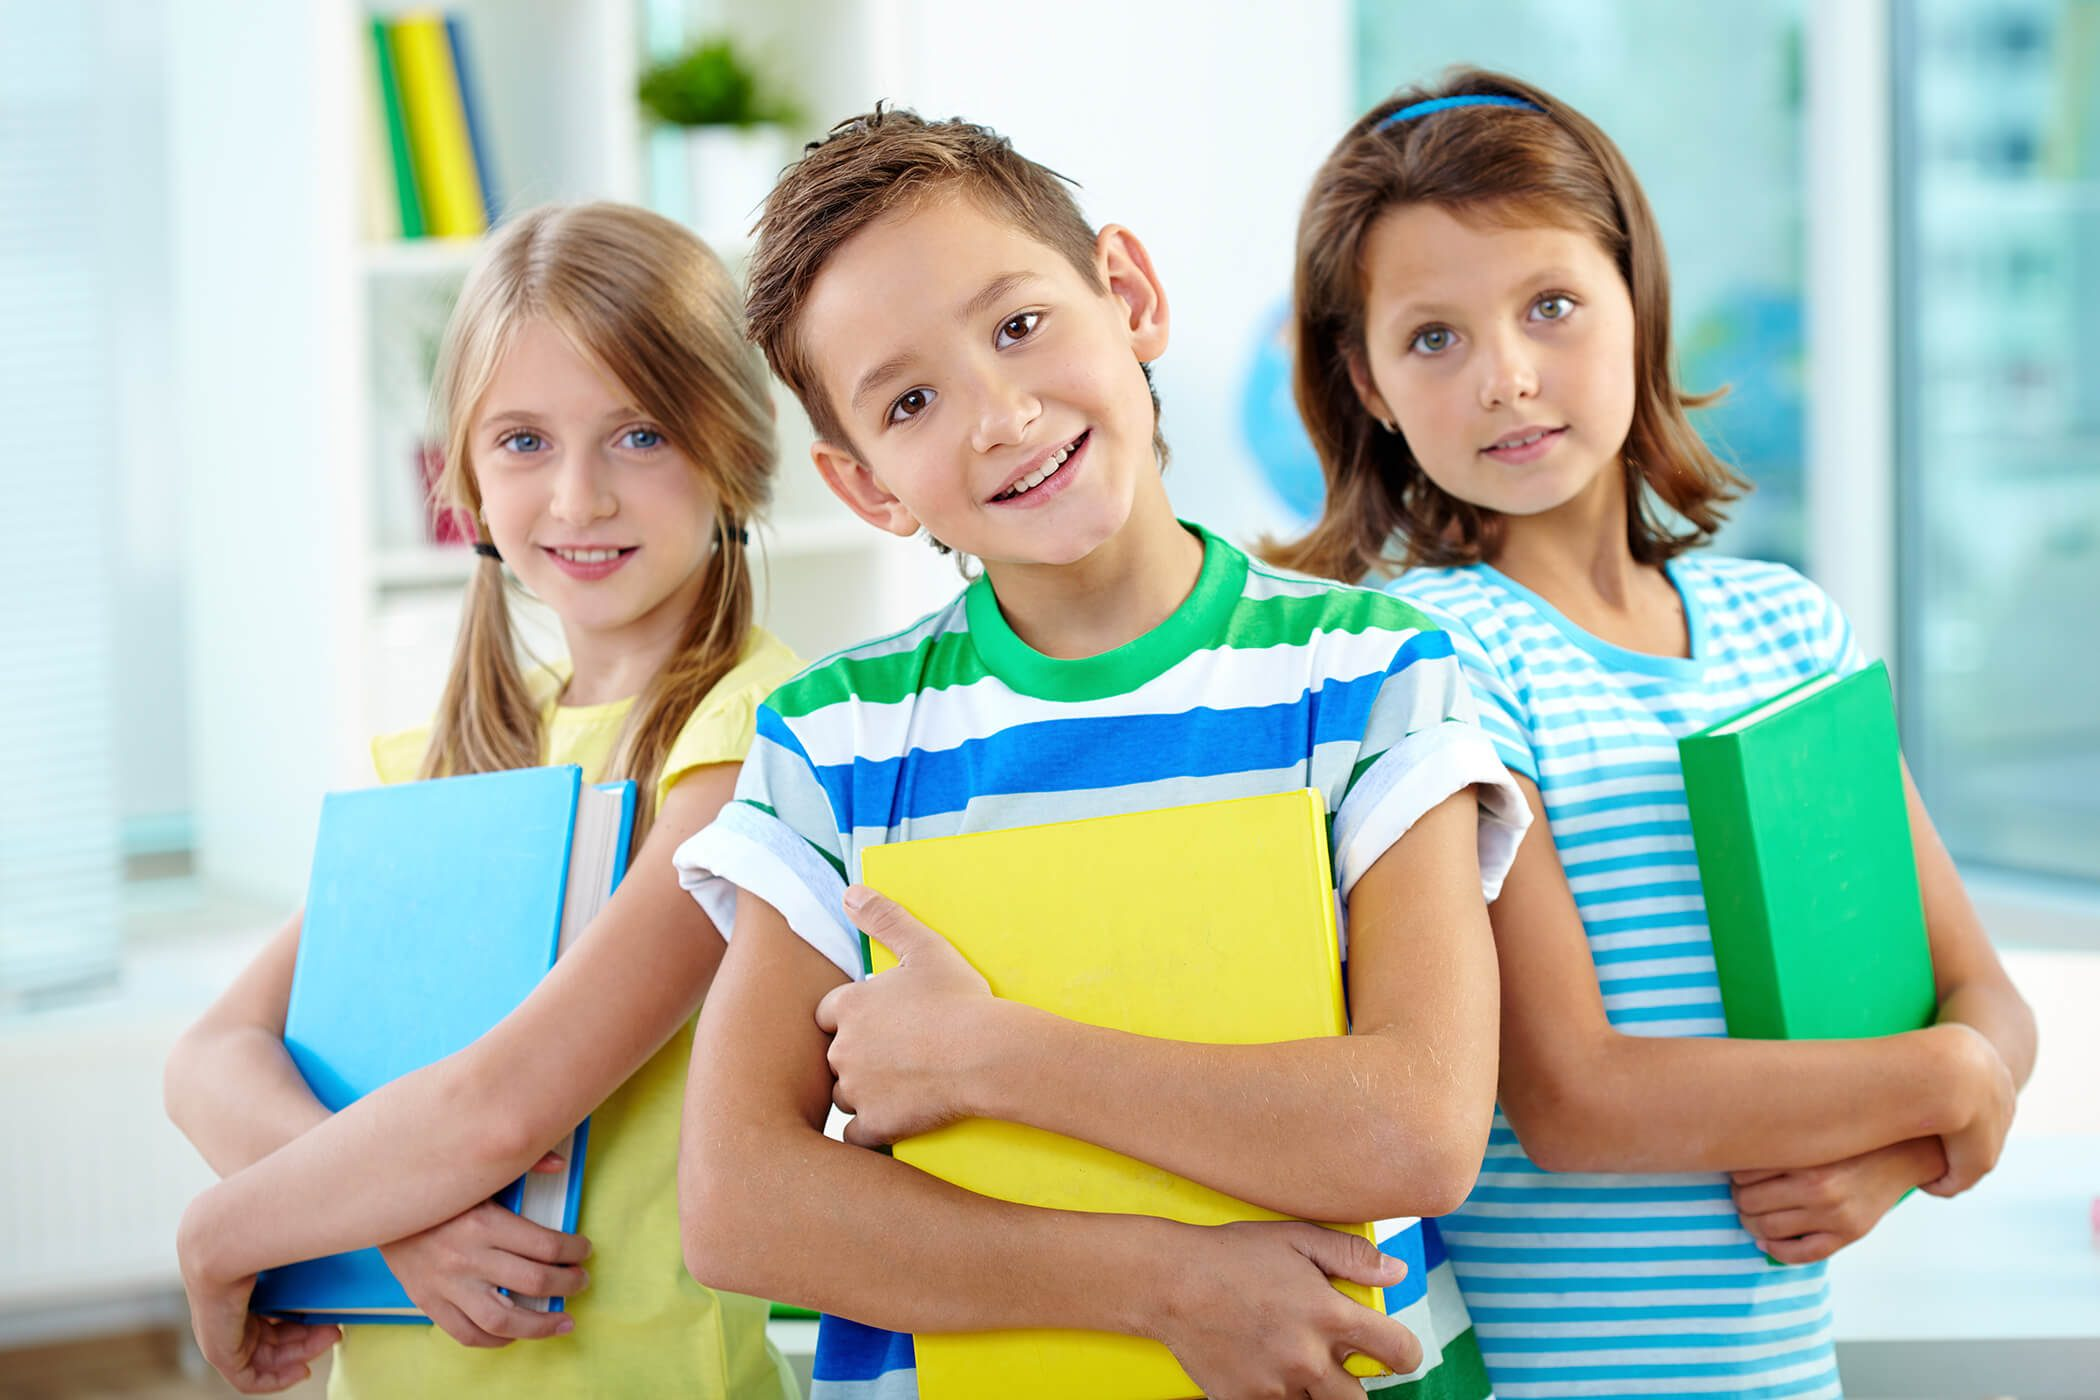 School, control over <br>(parents') money